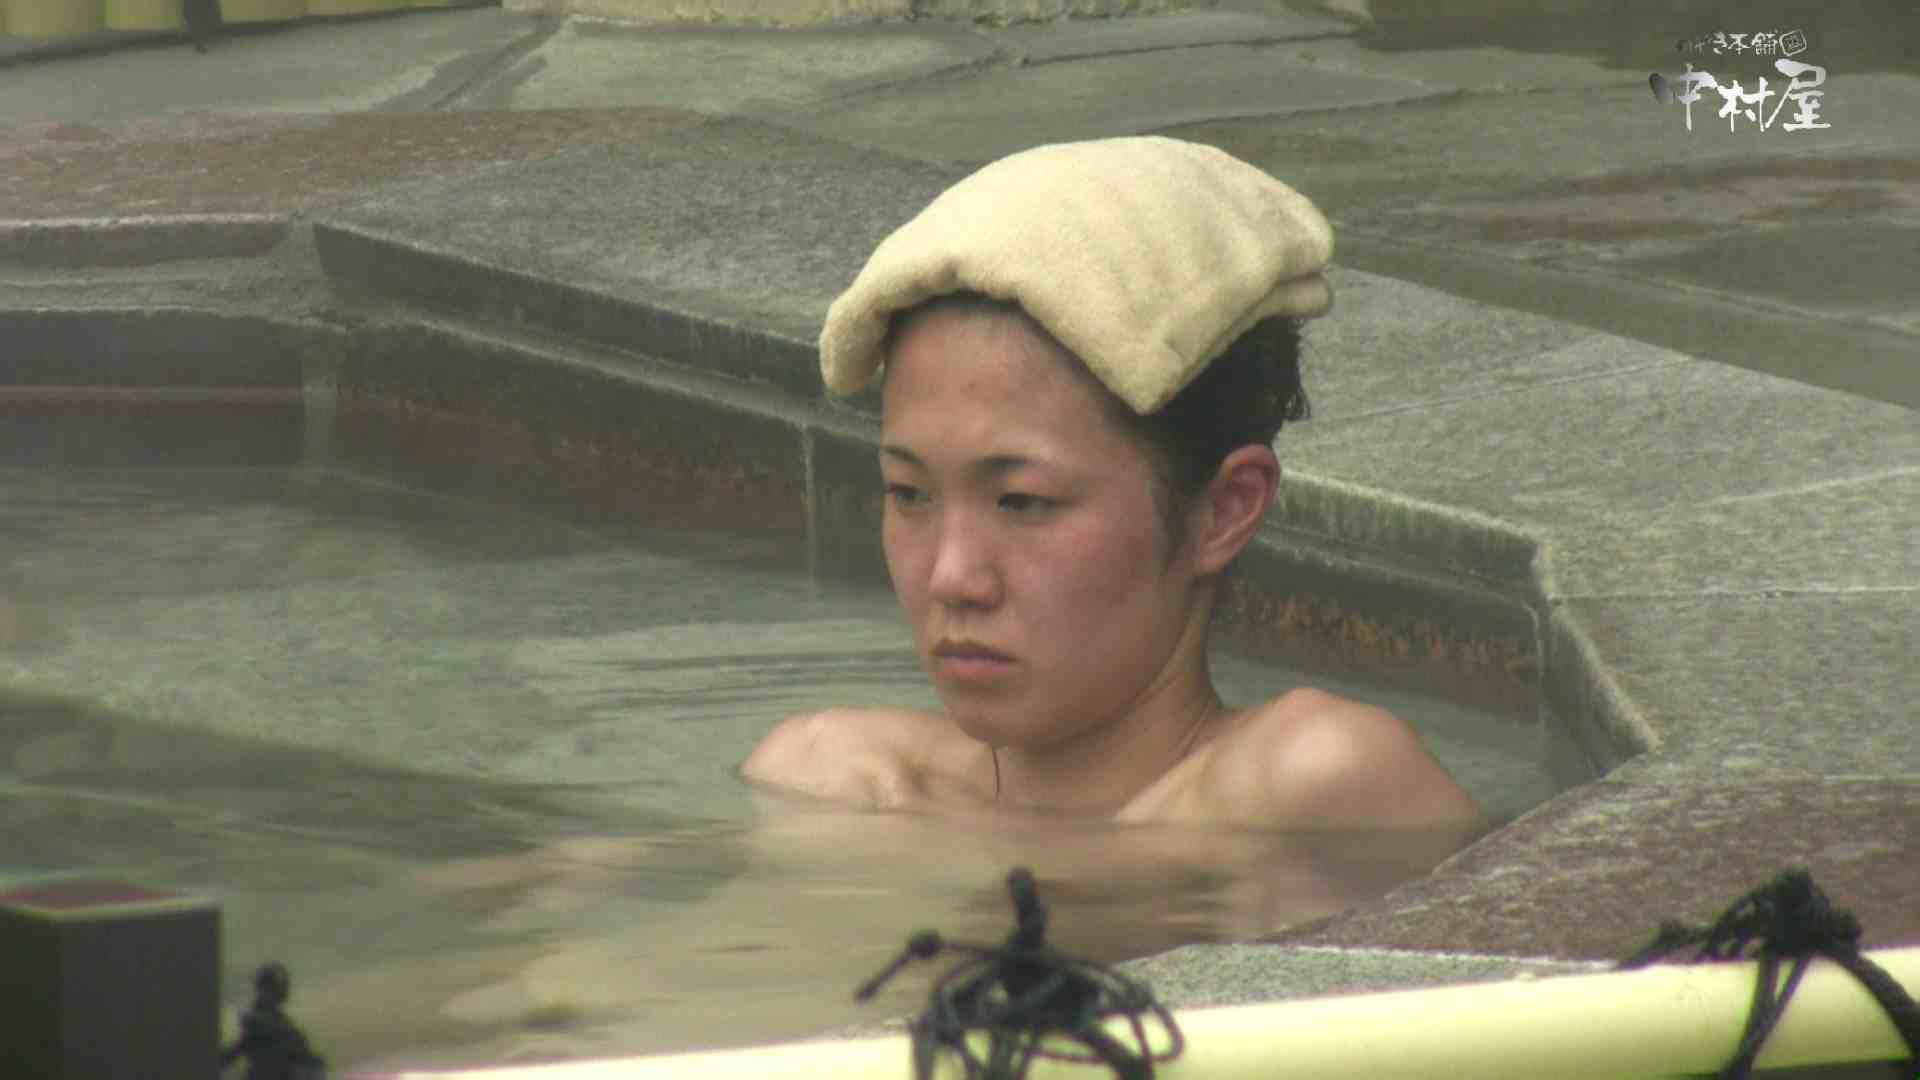 Aquaな露天風呂Vol.889 盗撮シリーズ | 露天風呂編  89PIX 15